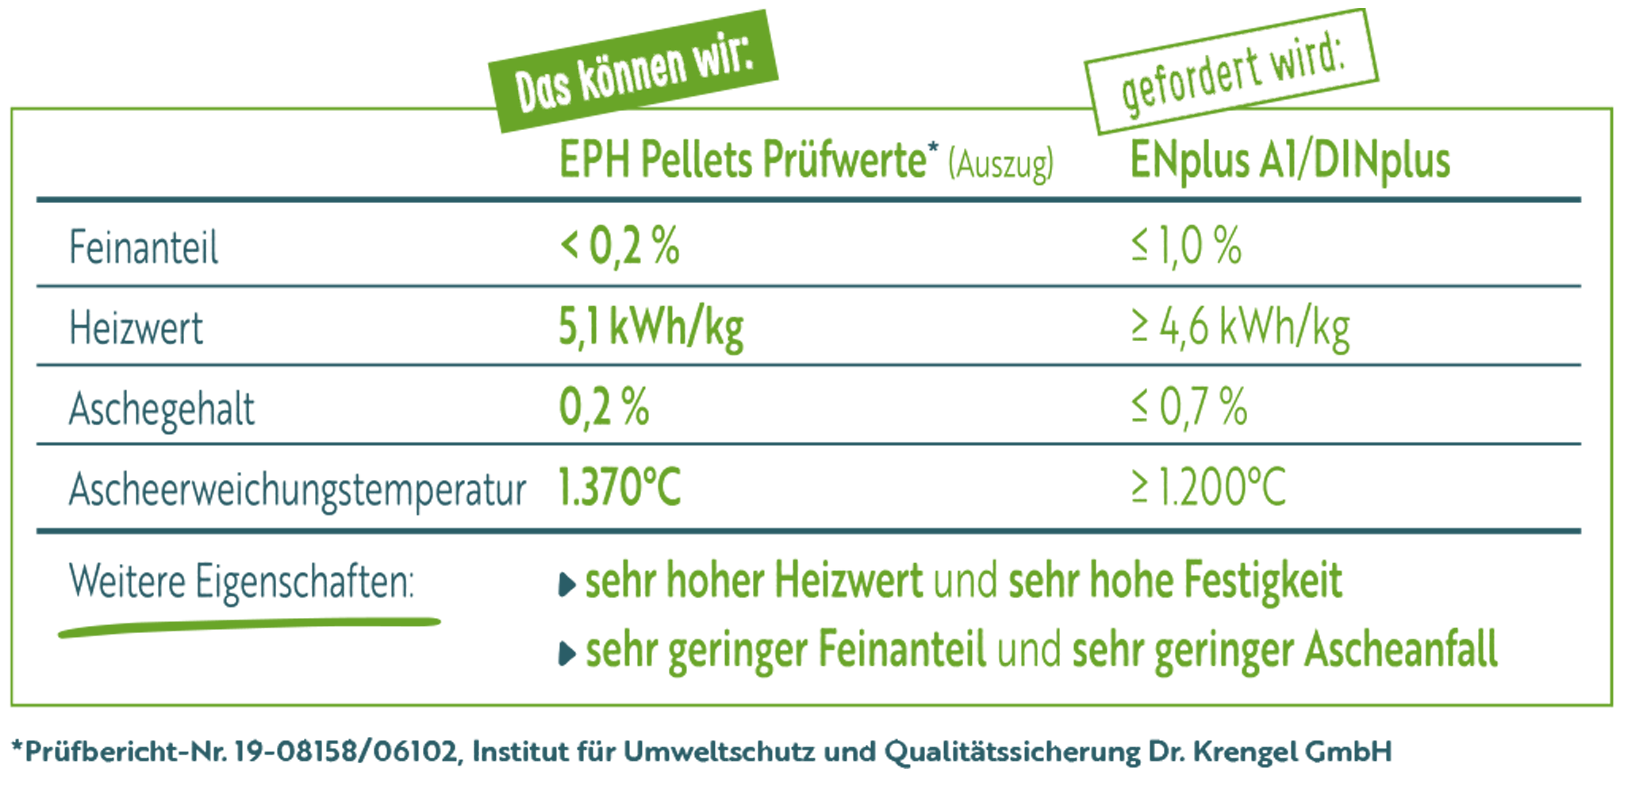 tabelle-pruefbericht2019